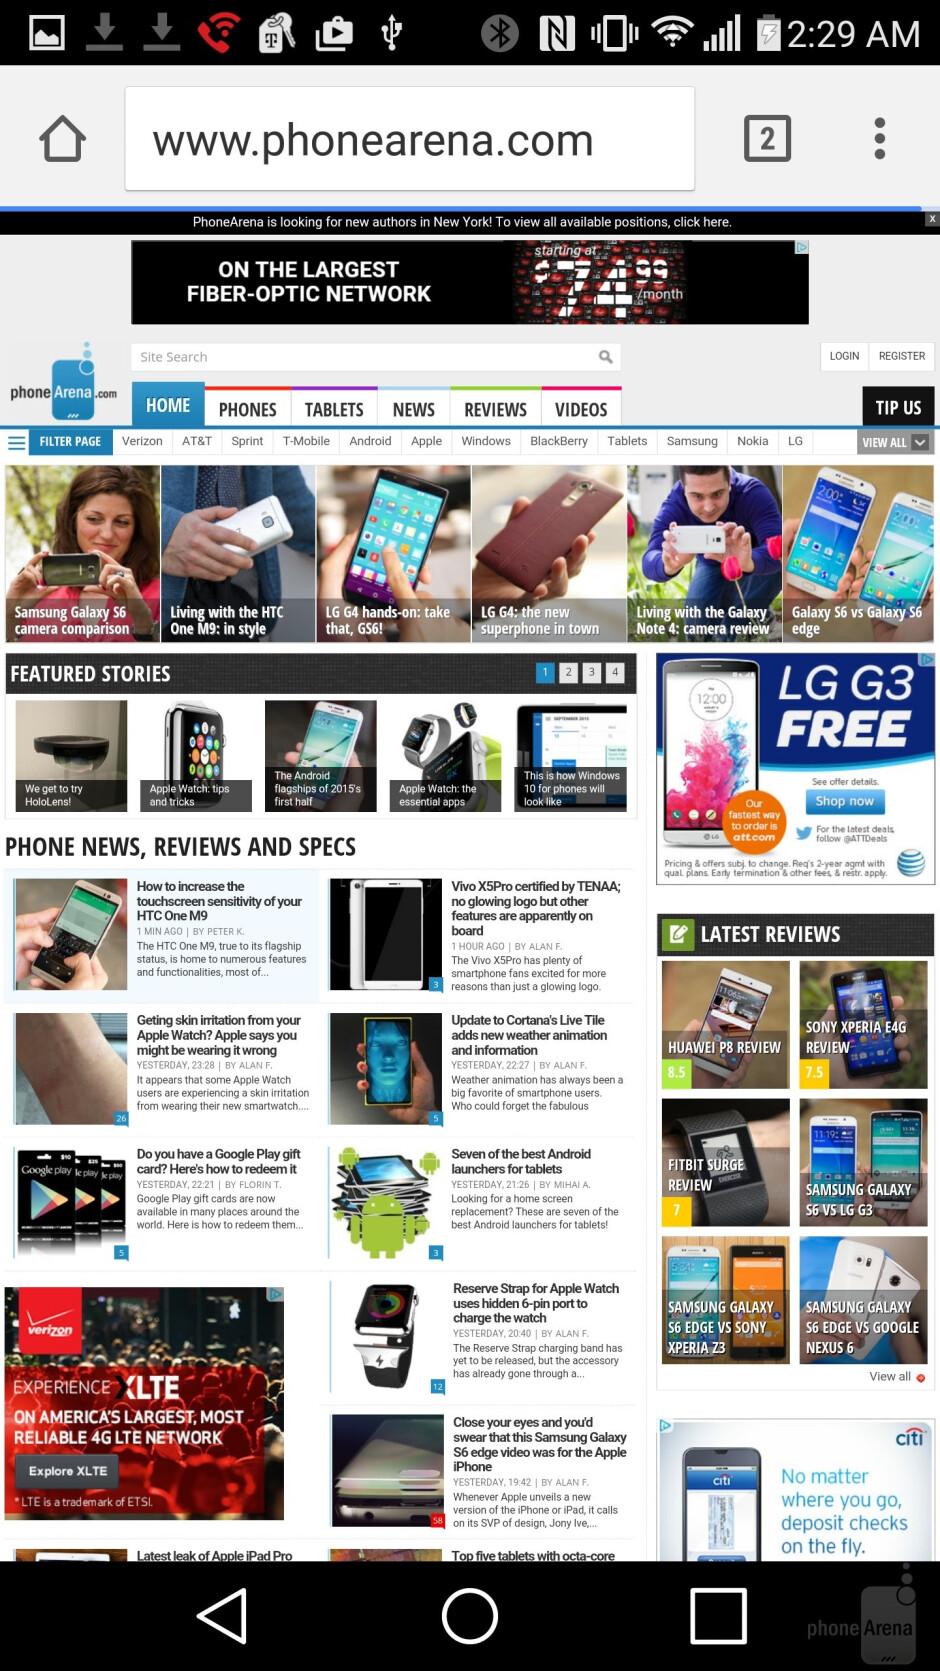 LG G4 - Internet browsing - LG G4 vs HTC One M9